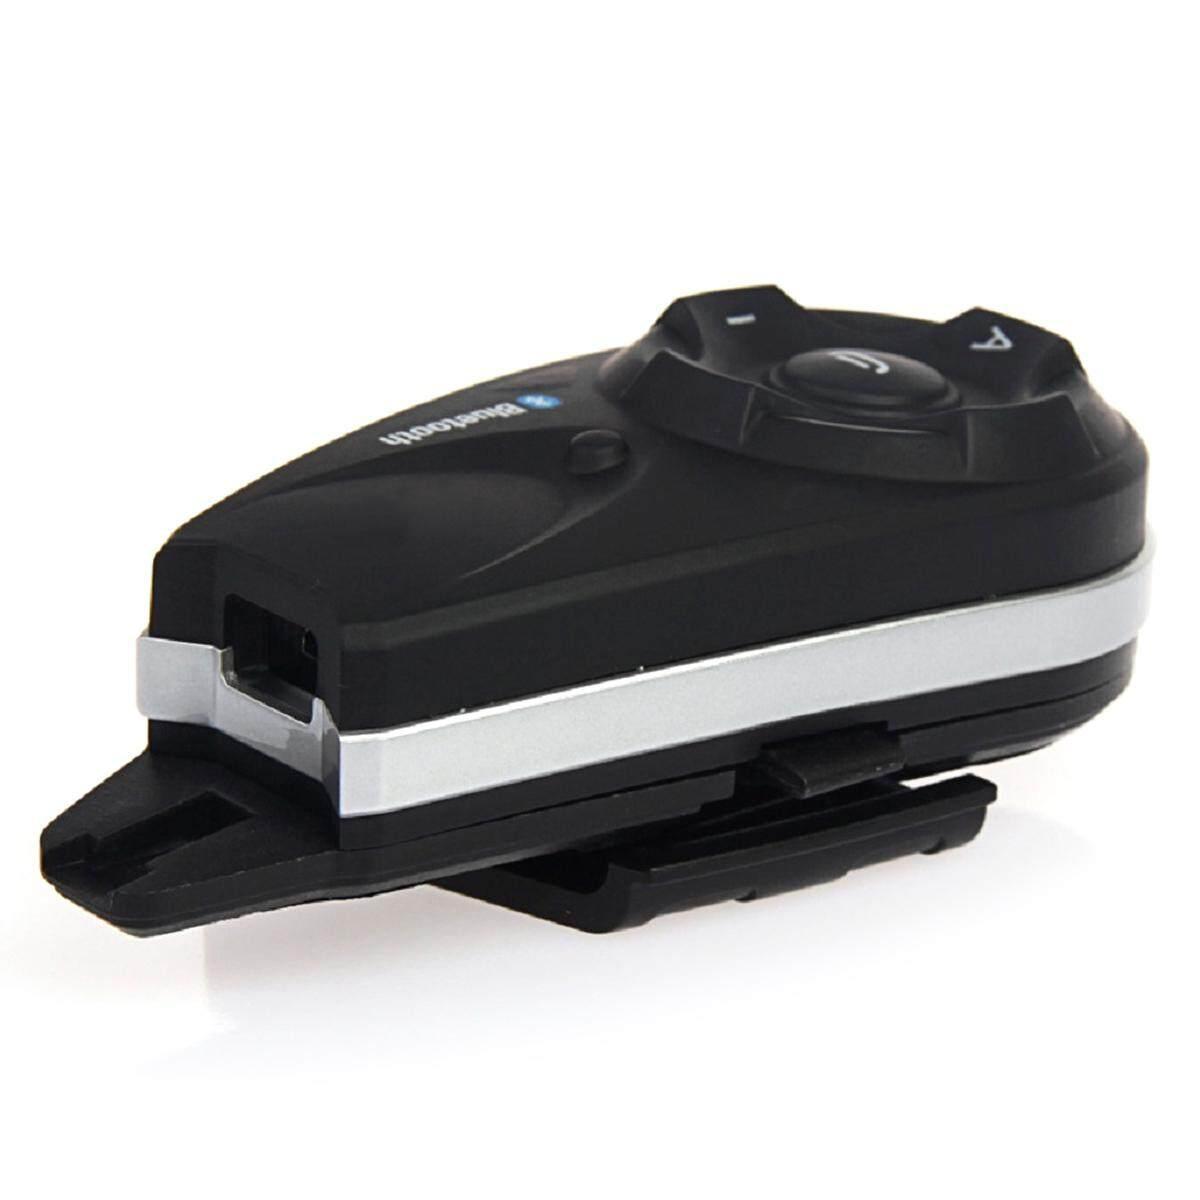 Detail Gambar Vnetphone V5-EU 1200 M Helm Bluetooth Sepeda Motor Headset Interkom untuk-Intl Terbaru